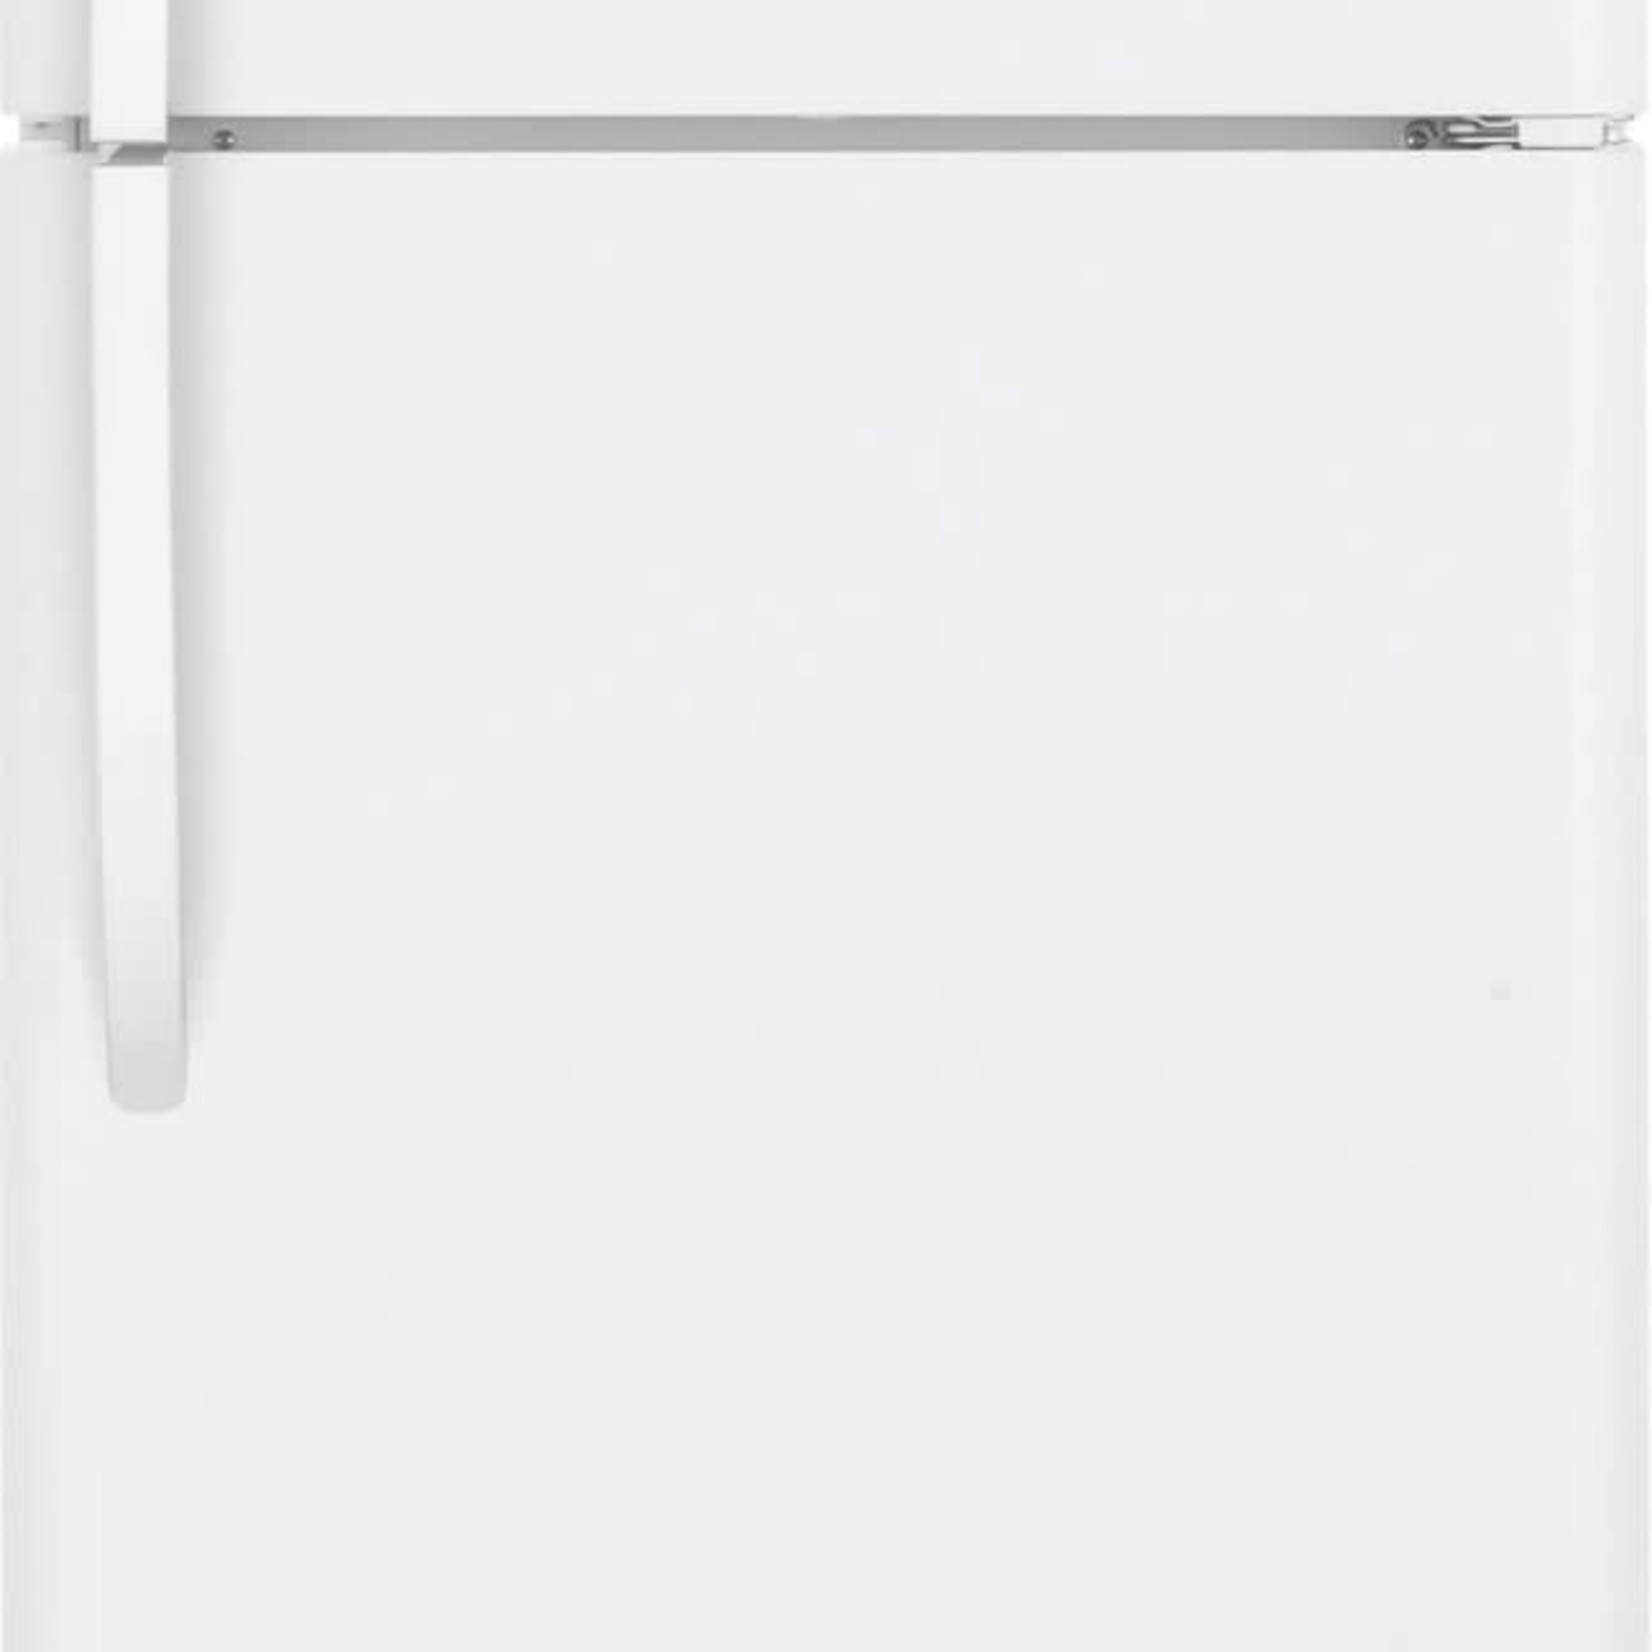 Frigidaire 18 Cu. Ft. Top Freezer Refrigerator FFHT1821TW 29.5Wx65Hx29D